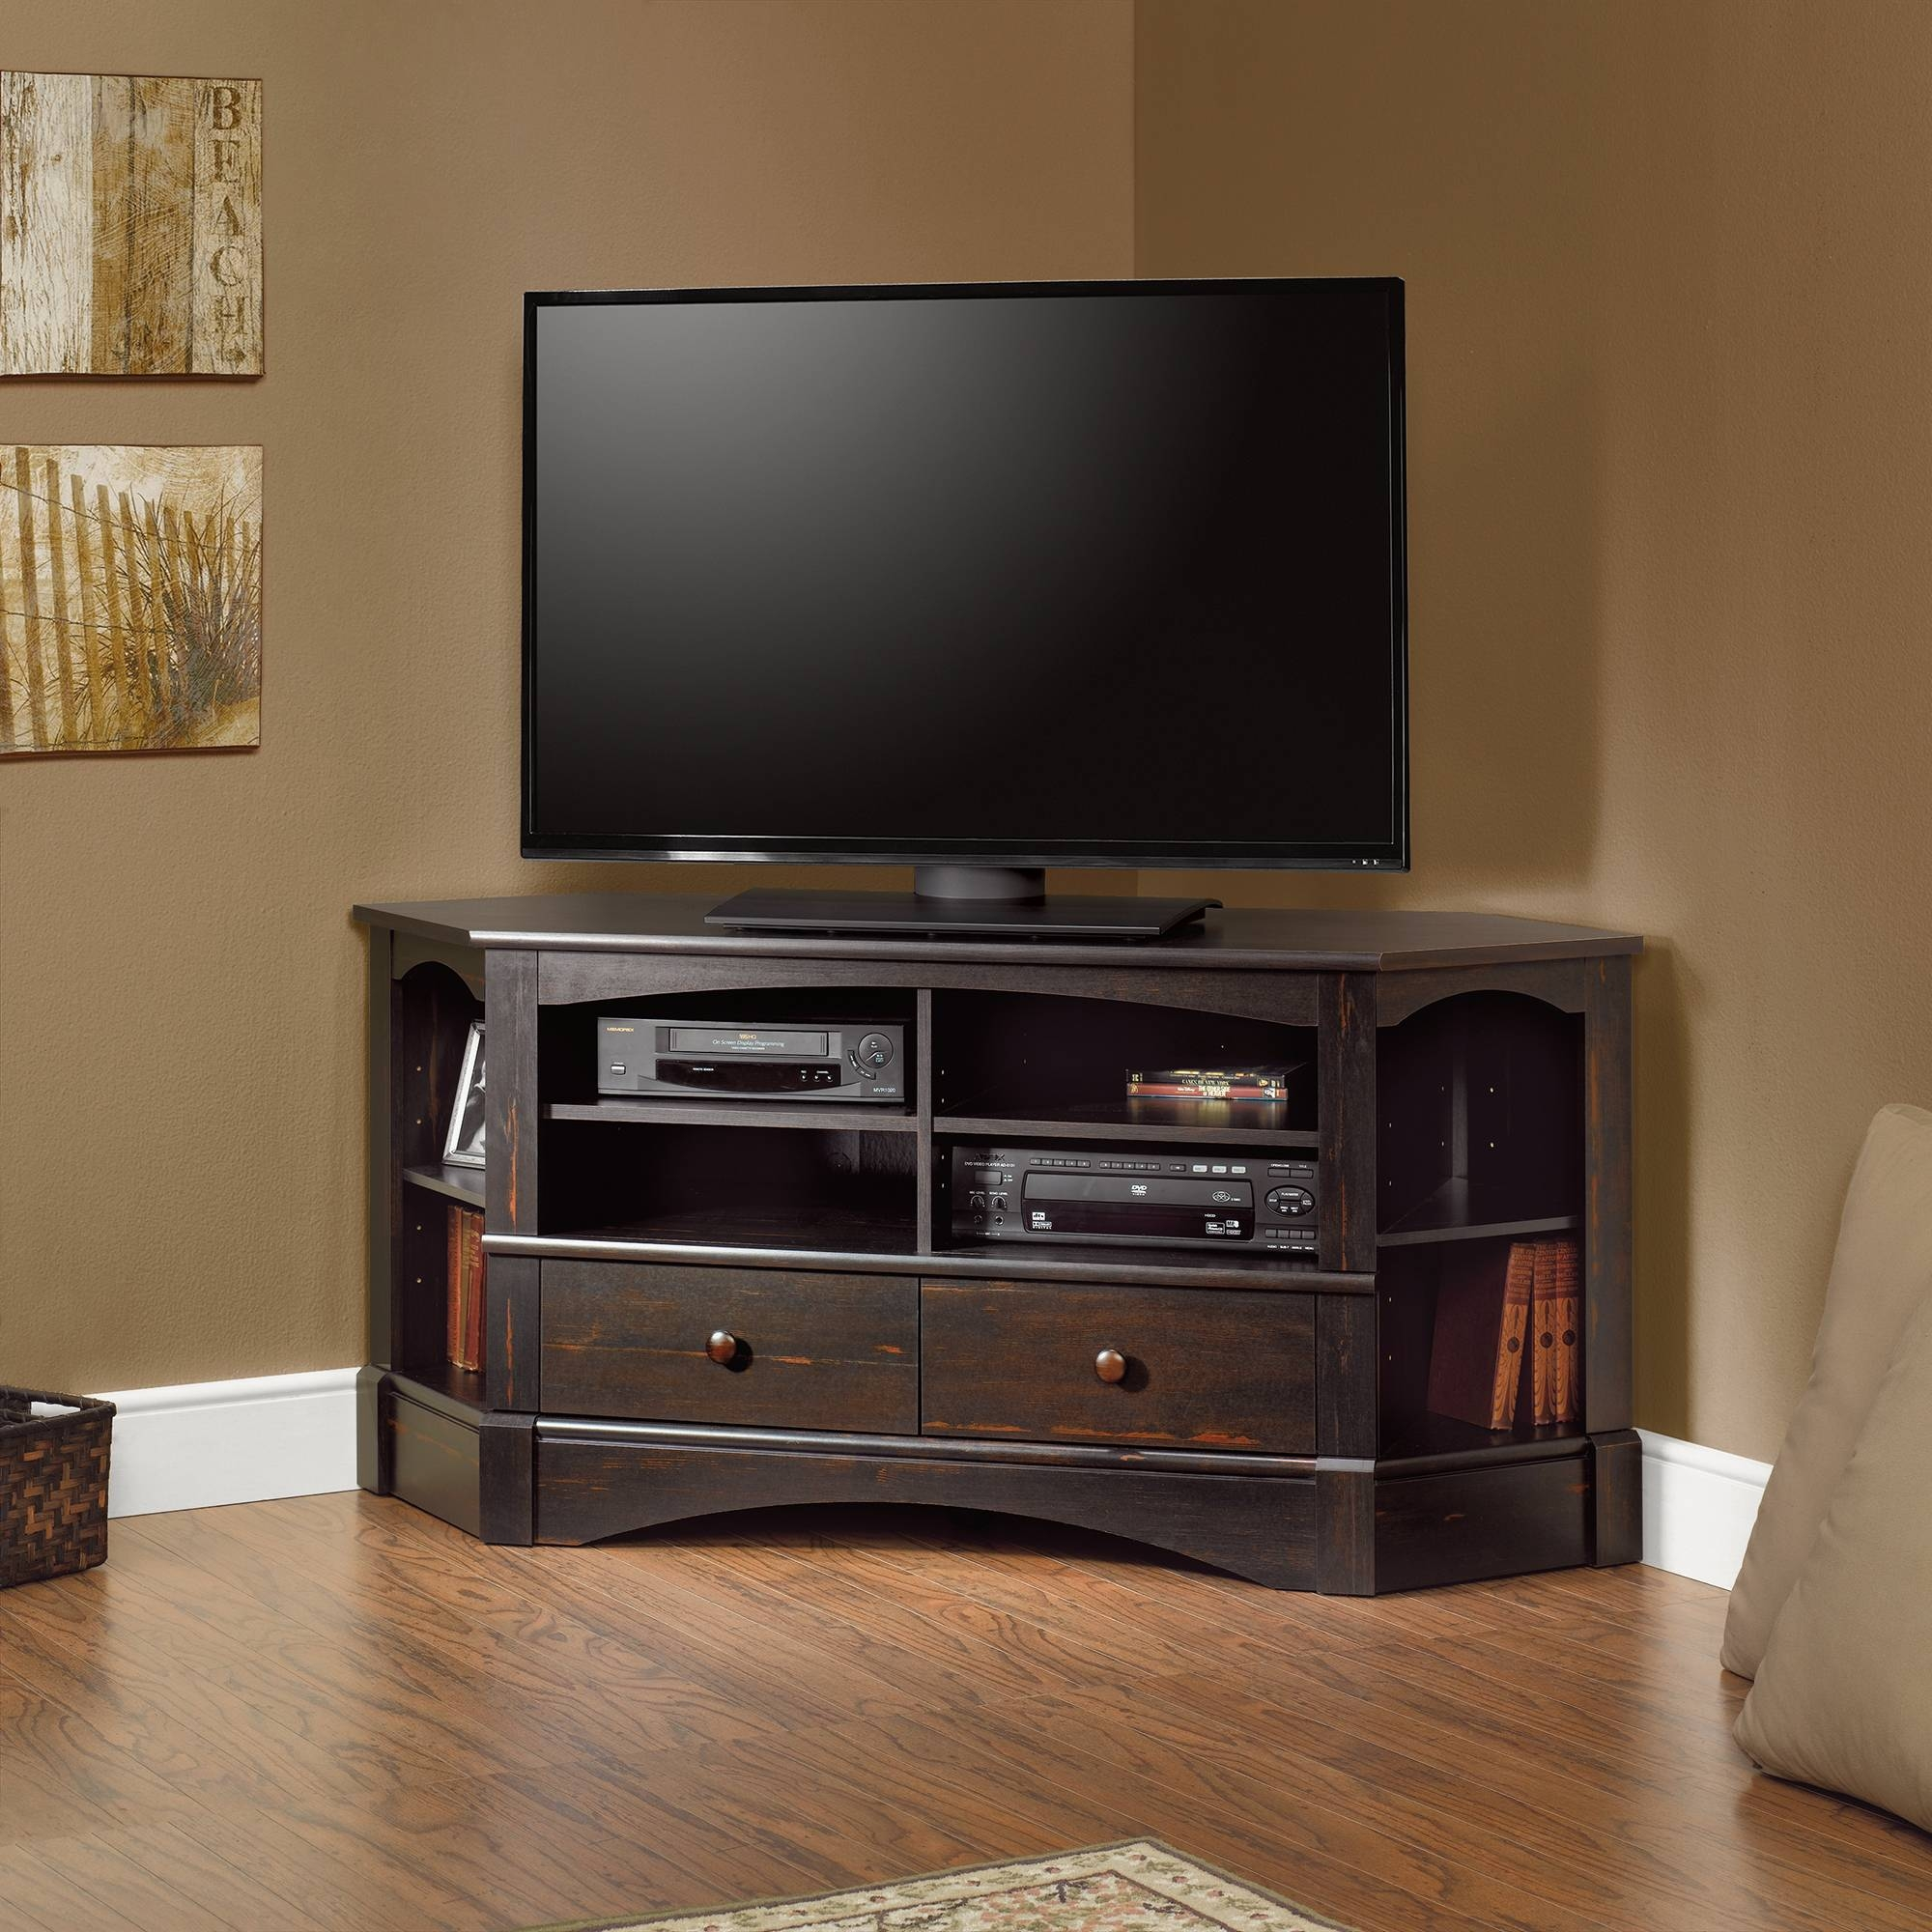 Harbor View   Corner Entertainment Credenza   402902   Sauder pertaining to Black Wood Corner Tv Stands (Image 7 of 15)